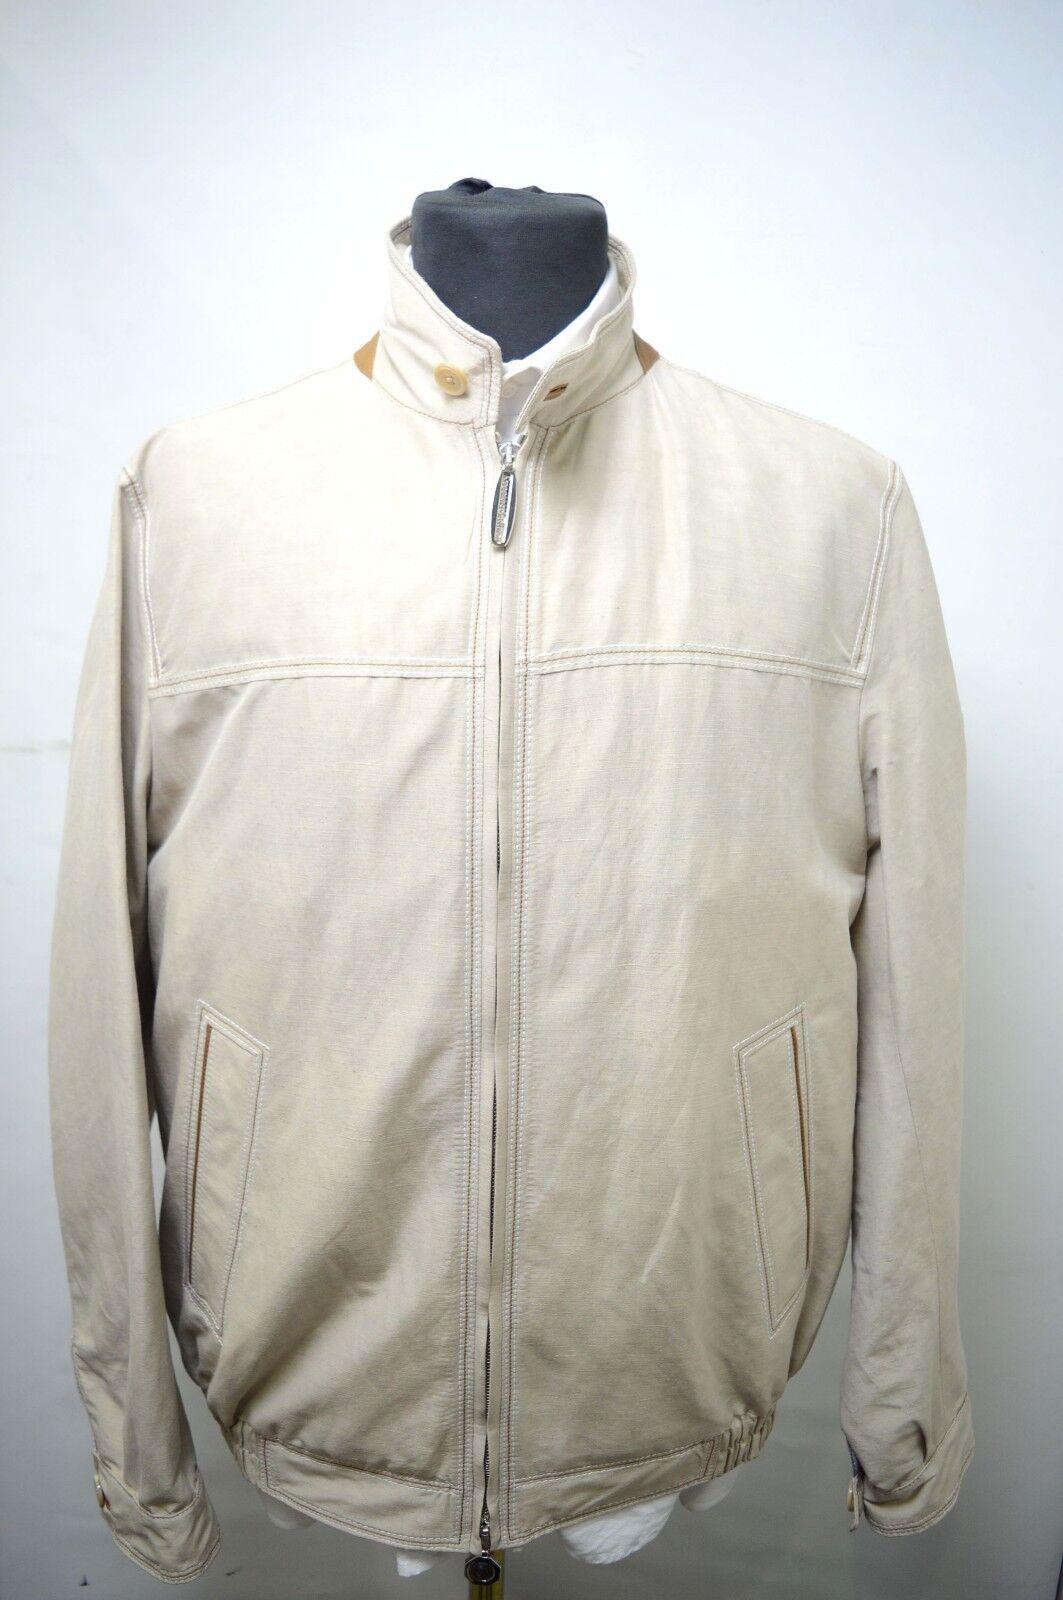 NEW 8750,00  STEFANO RICCI  Outwear Top Over Coat Leder Us M Eu 50 (G134)